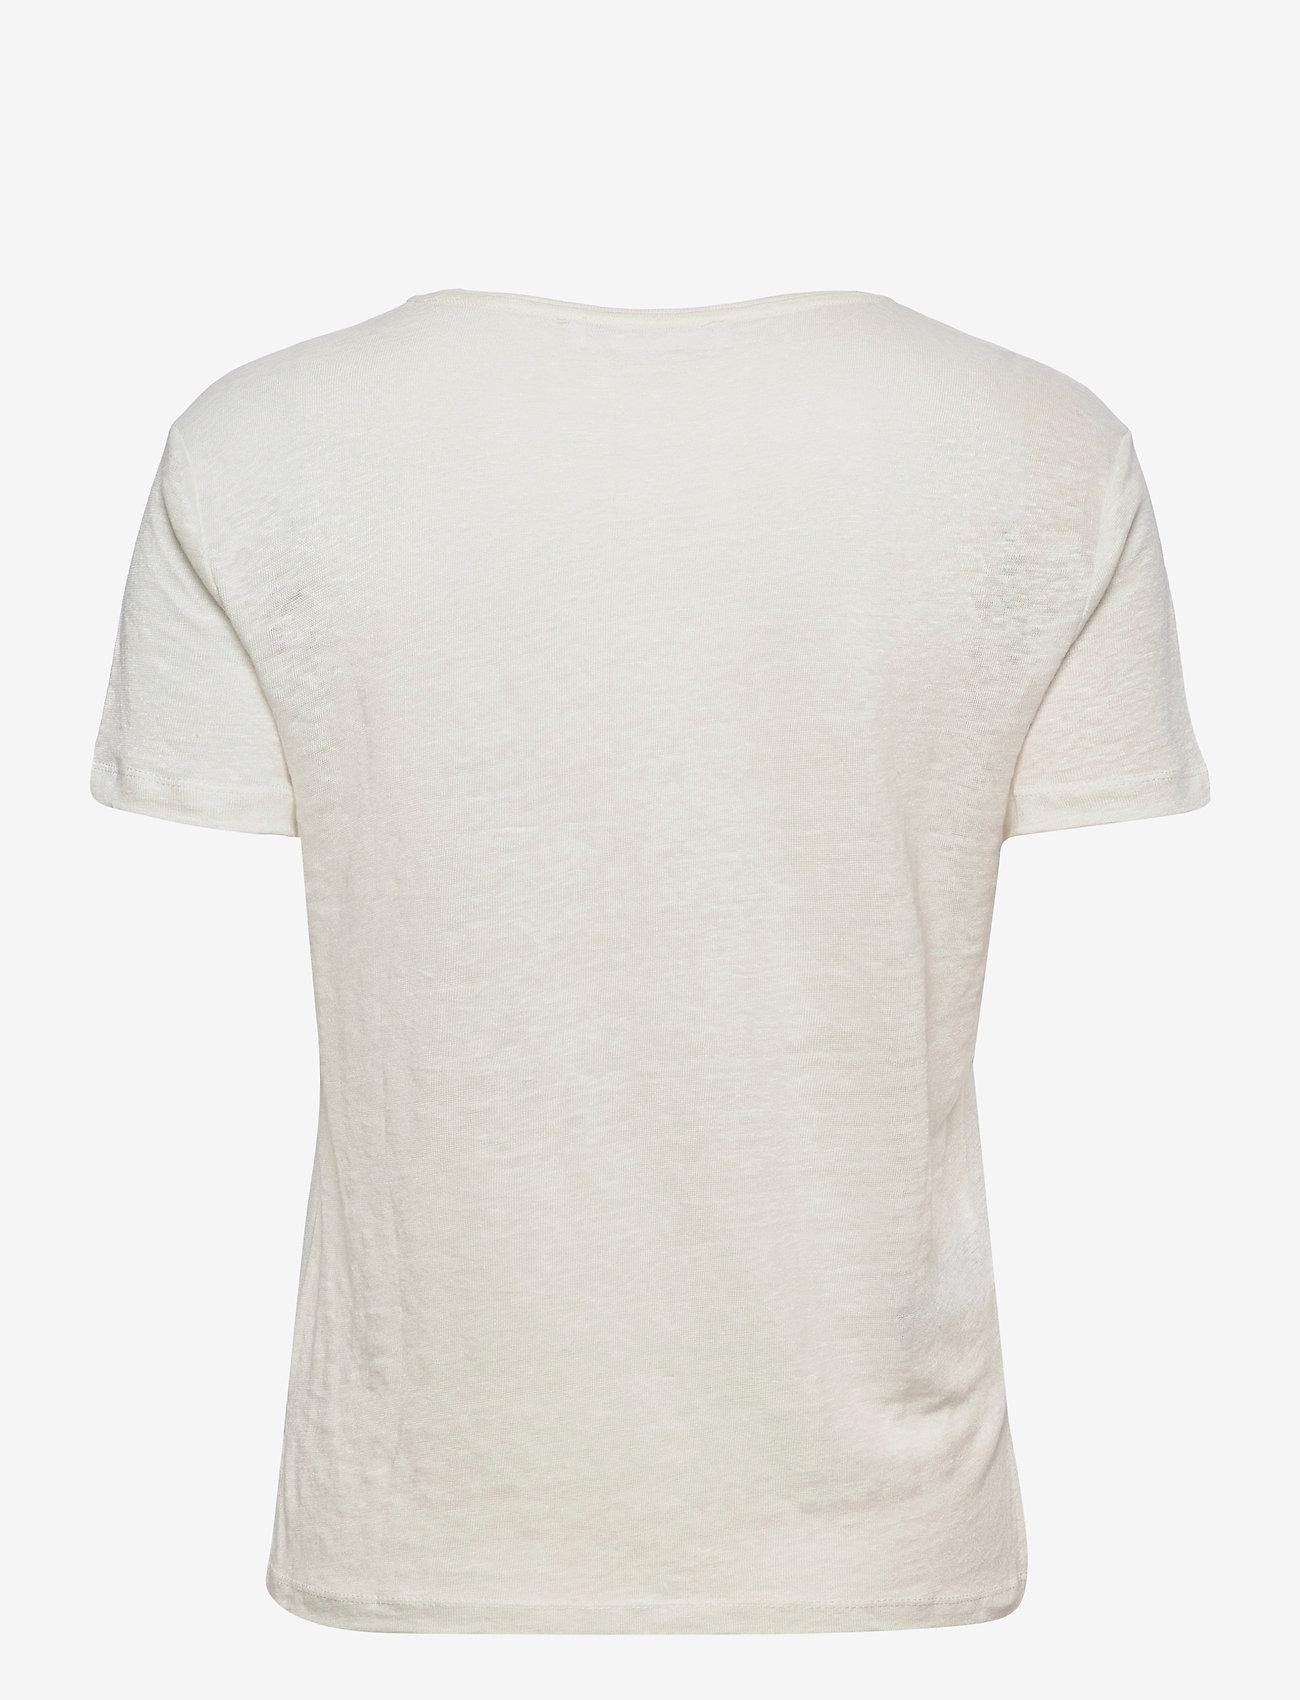 Mango - LISINO - t-shirts - offwhite - 1